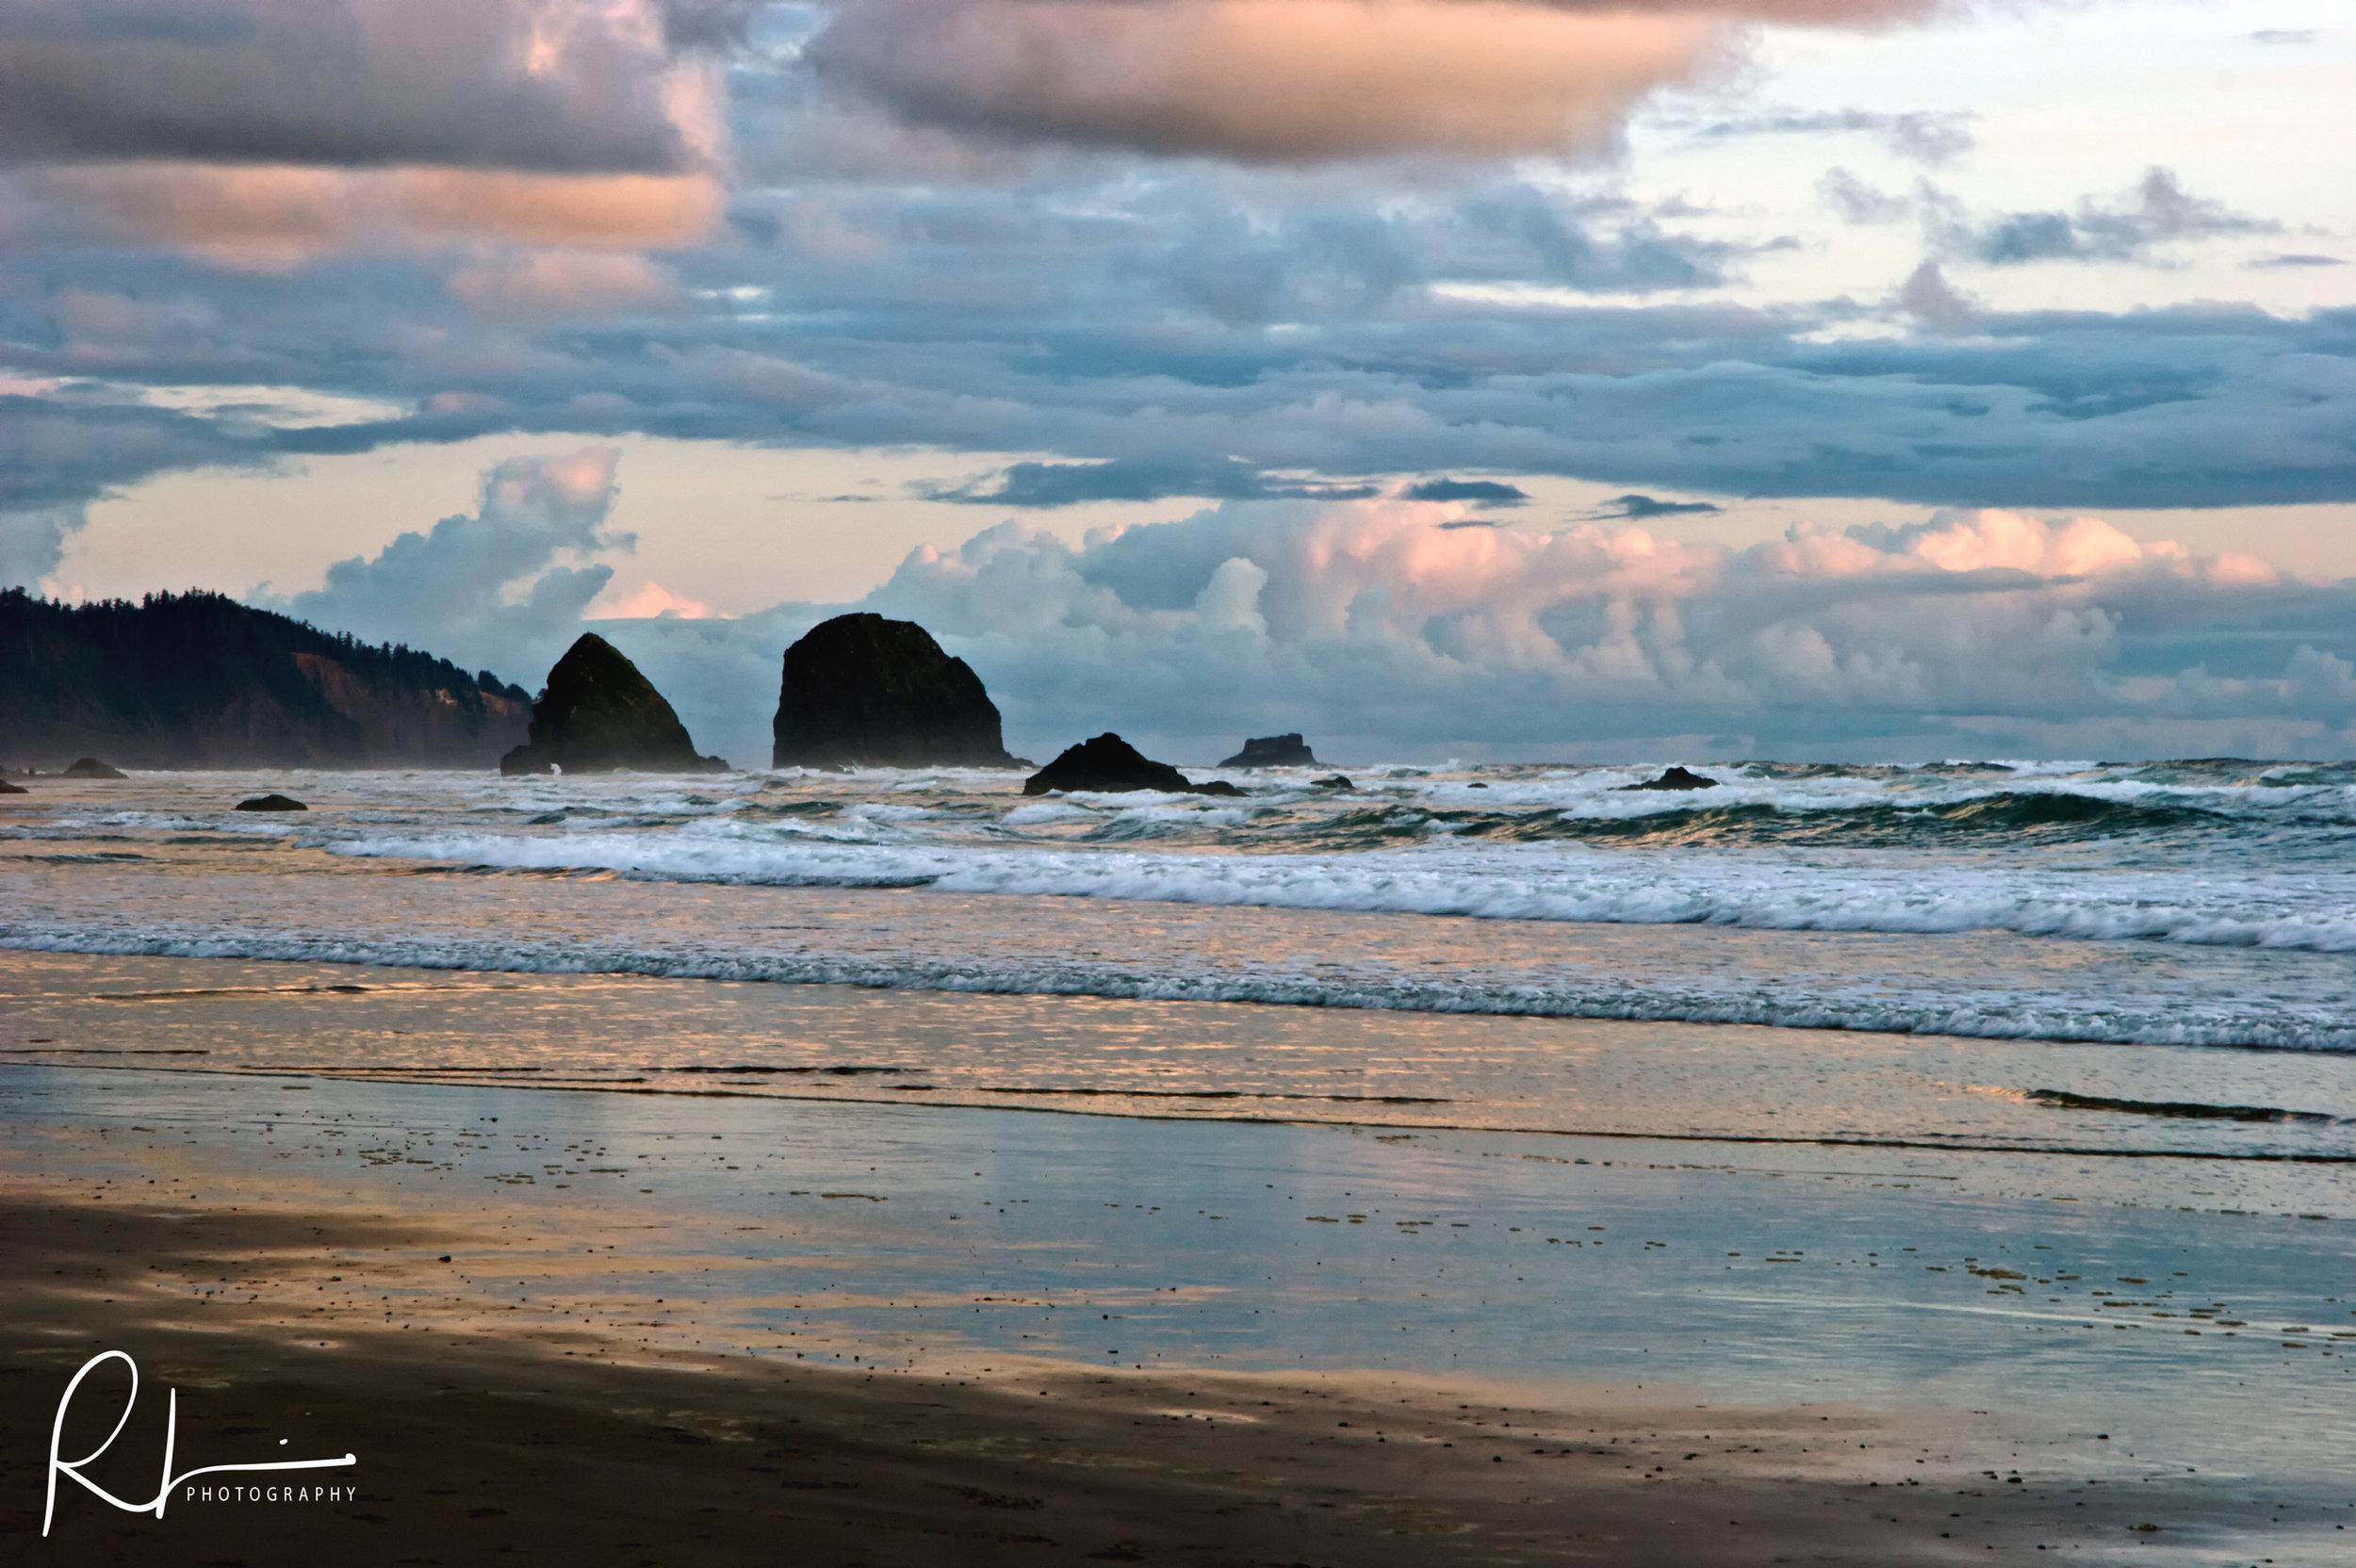 Beach scene in Oregon